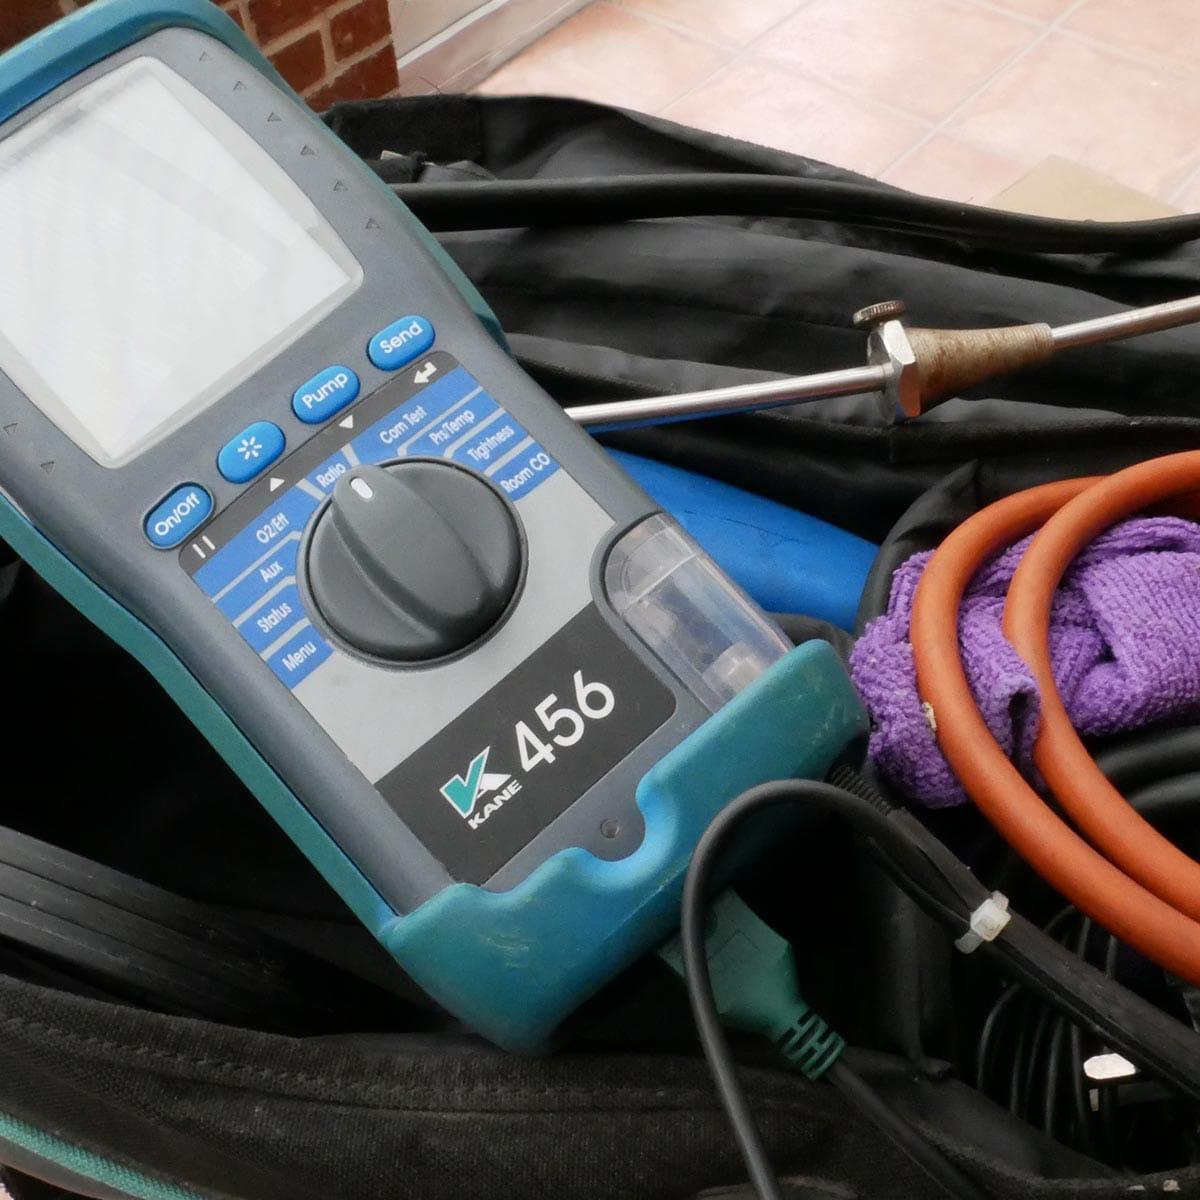 boiler emissions testing equipment